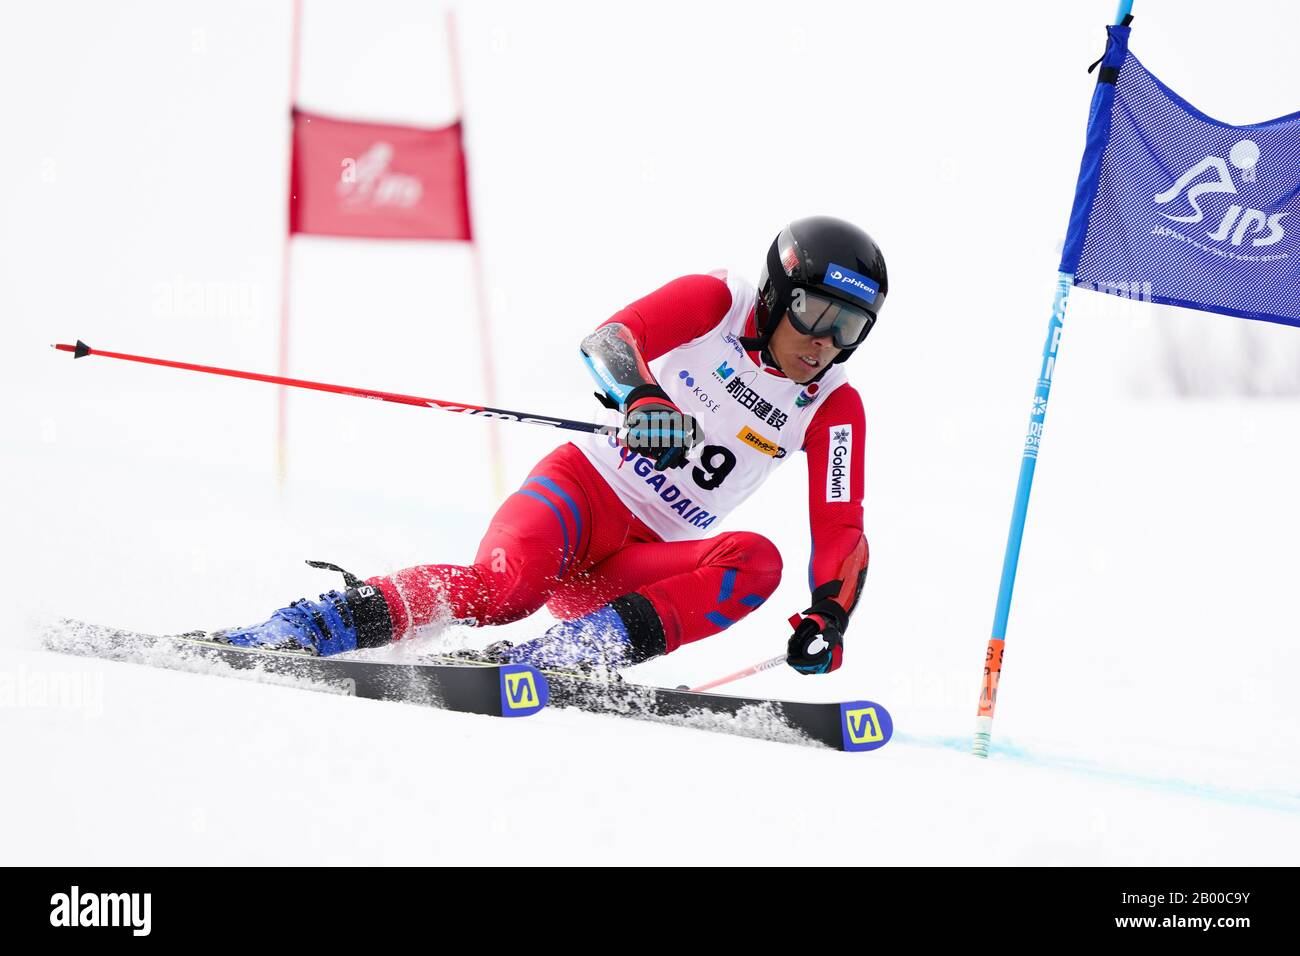 Ueda, Nagano, Japan. 14th Feb, 2020. Kodai Nakamura (JPN), February 14, 2020 - Alpine Skiing : Men's Giant Slalom Deaf at Sugadaira Pine Beak during 2020 World Para Alpine Skiing Asia Cup in Ueda, Nagano, Japan. Credit: SportsPressJP/AFLO/Alamy Live News Stock Photo